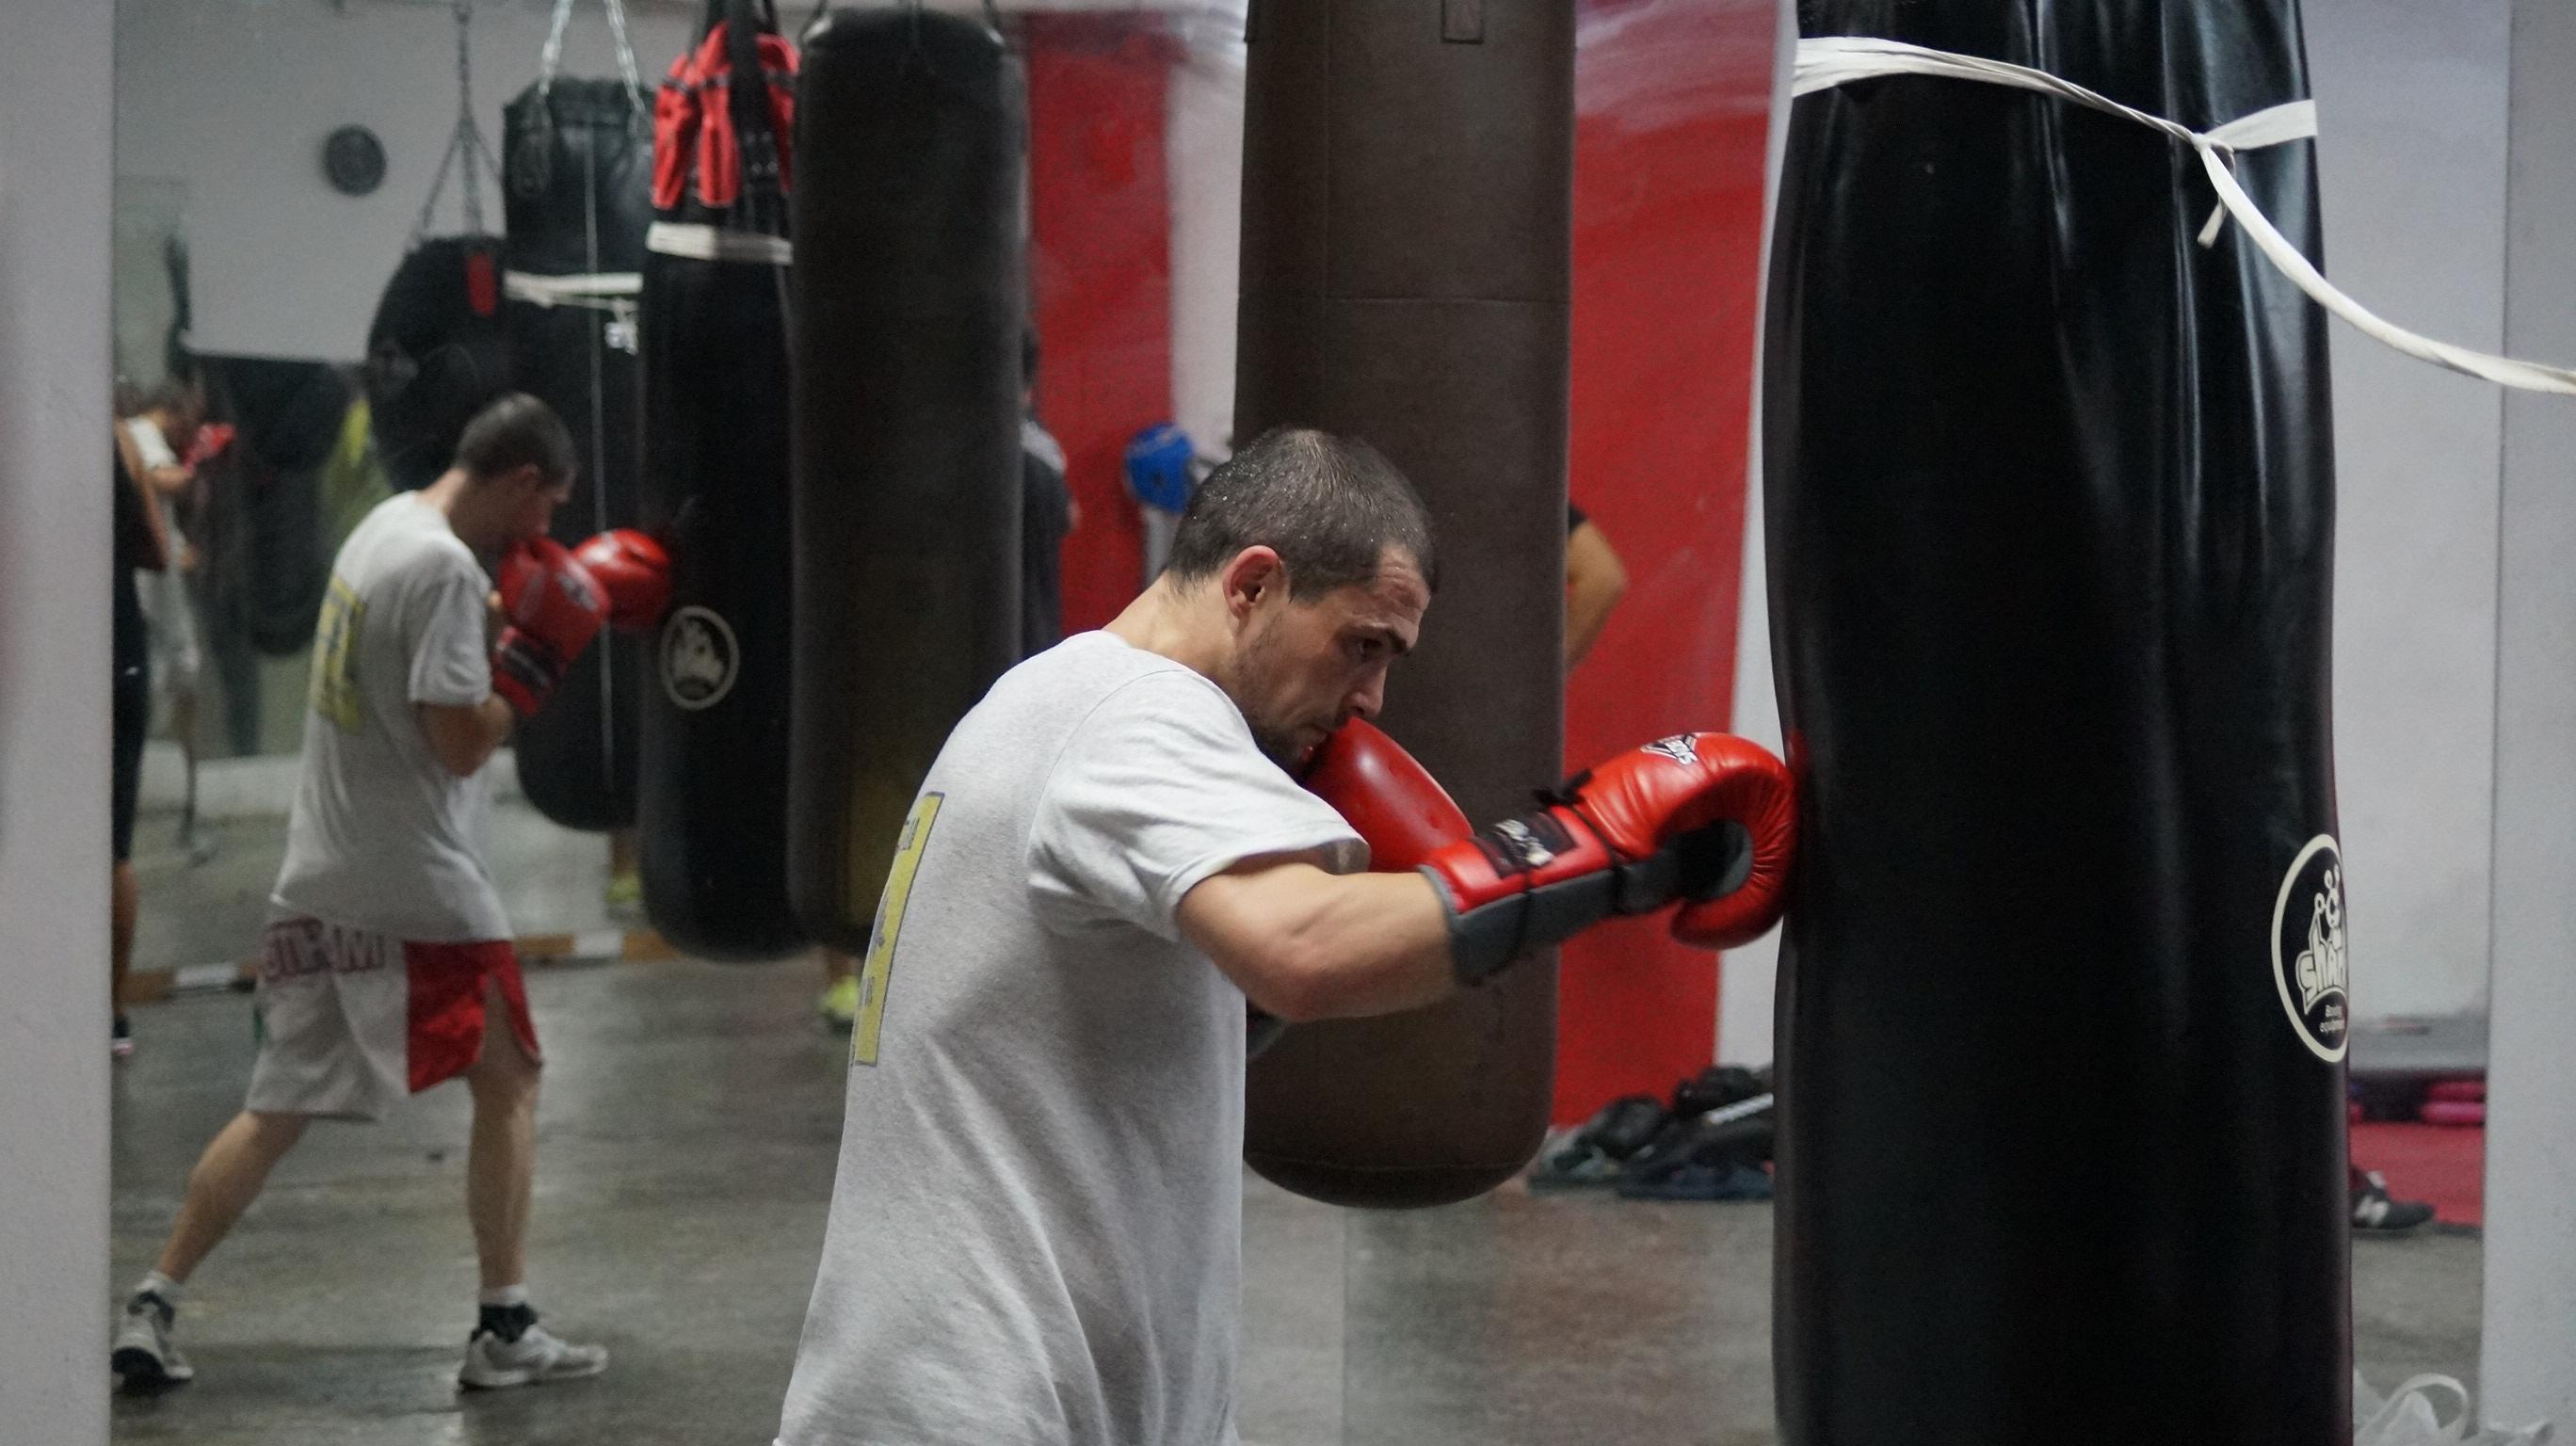 El boxeador profesional bilbaino, Andoni Gago, entrenando